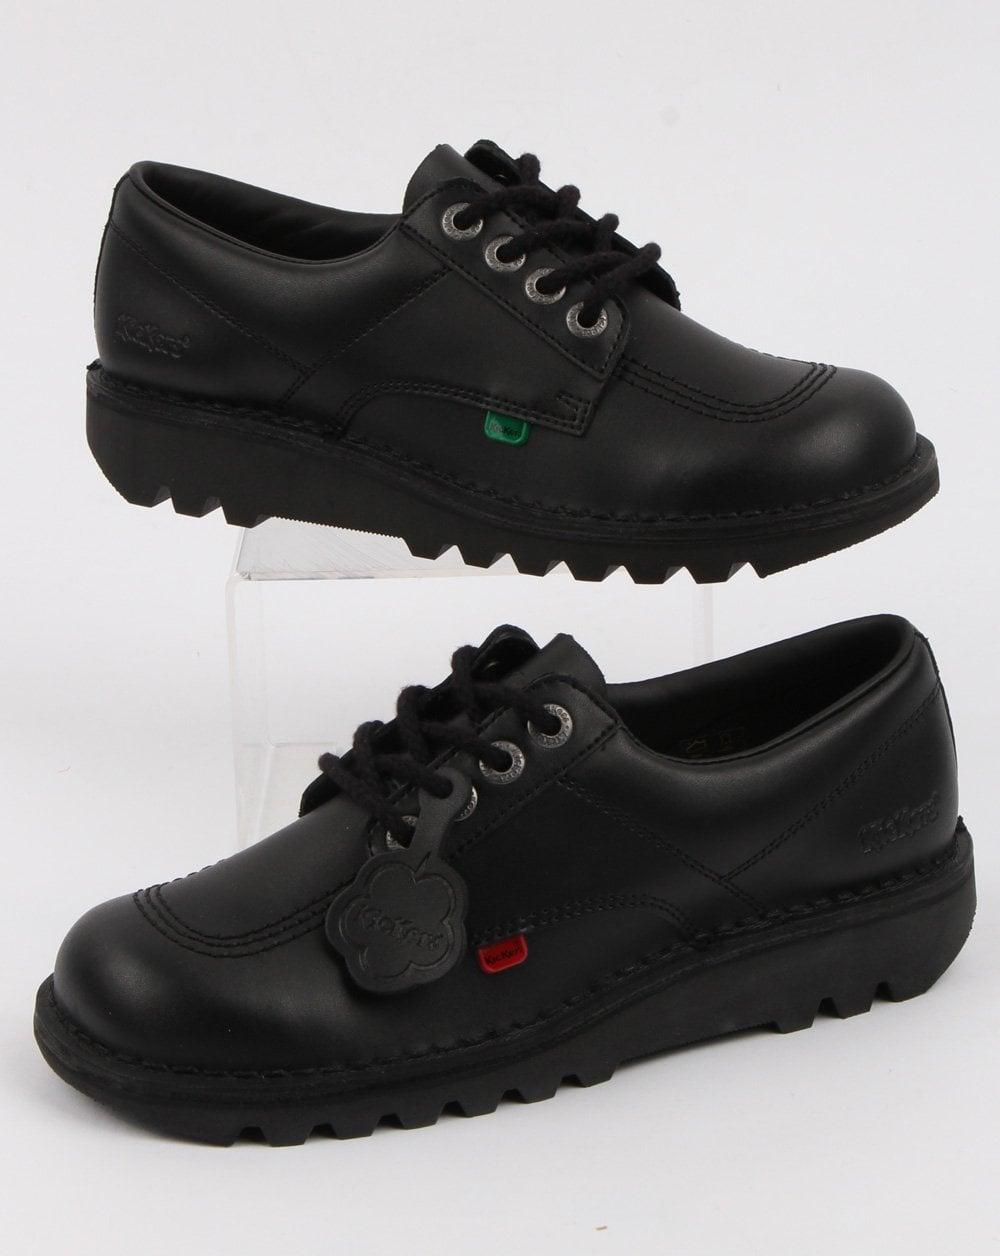 b63bf87706 Kickers Kick Lo Shoes Black | 80s casual classics